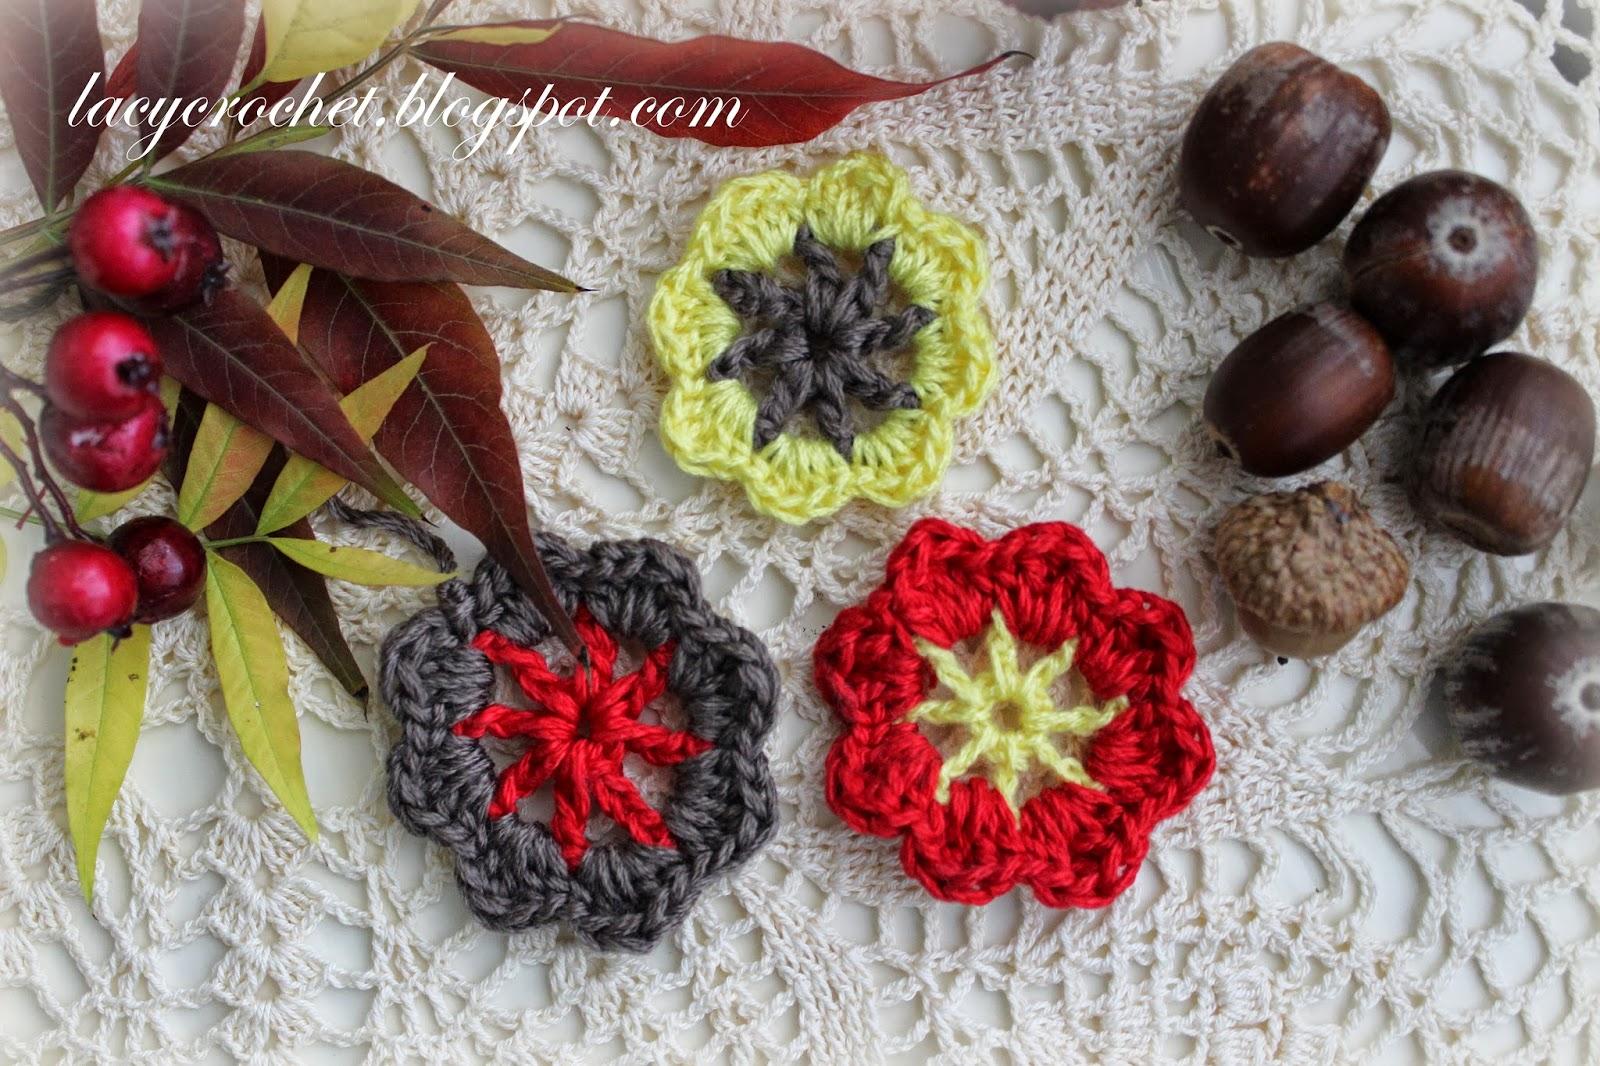 Lacy Crochet: Crochet Autumn Flowers